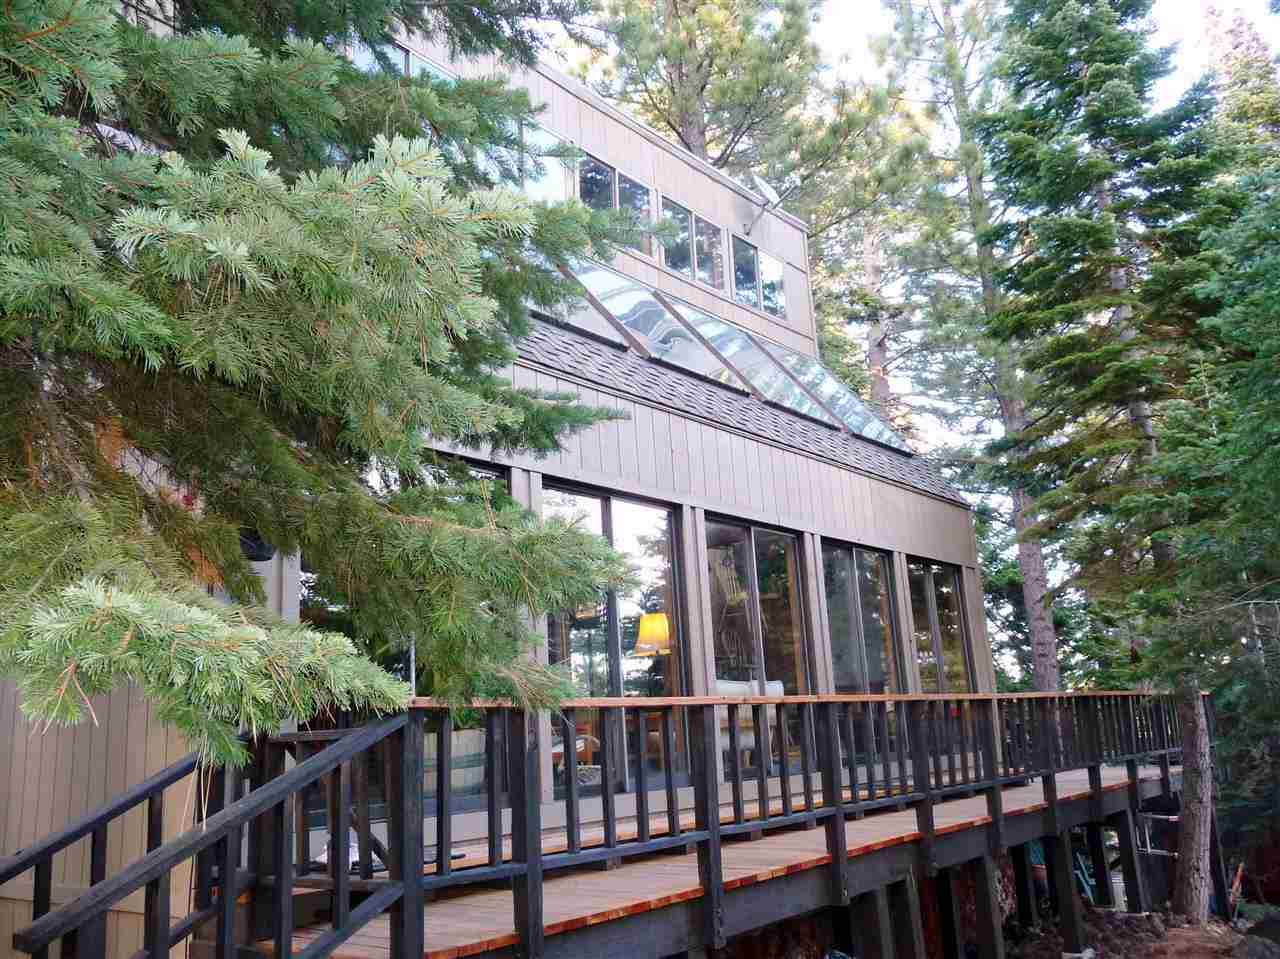 Casa Unifamiliar por un Venta en 220 Talmont Circle 220 Talmont Circle Tahoe City, California 96245 Estados Unidos